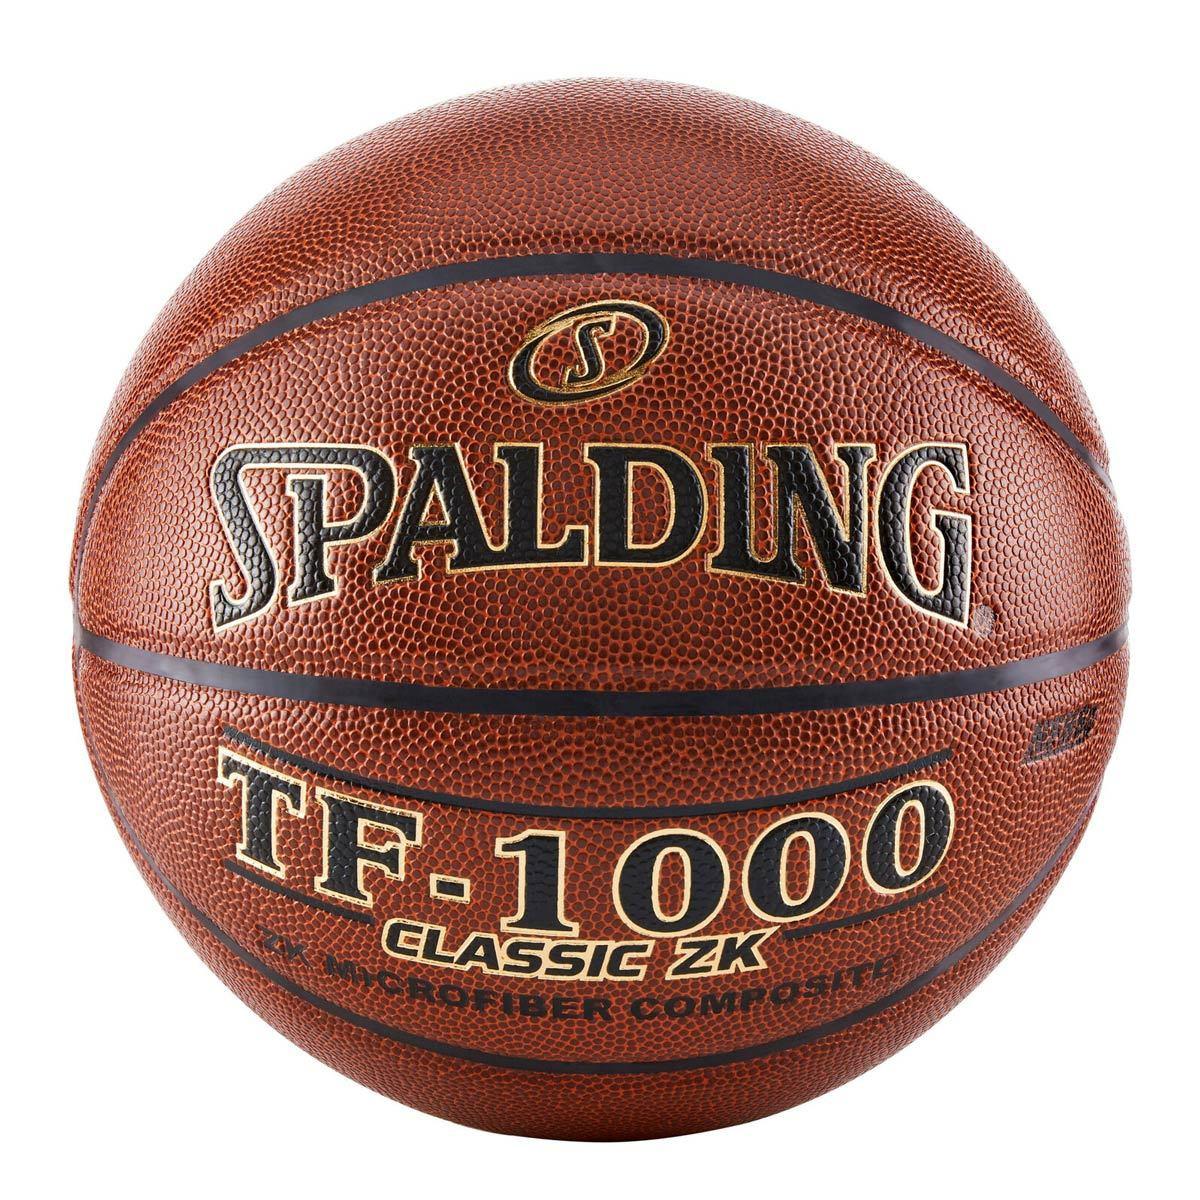 Spalding TF-1000 Classic Basketball